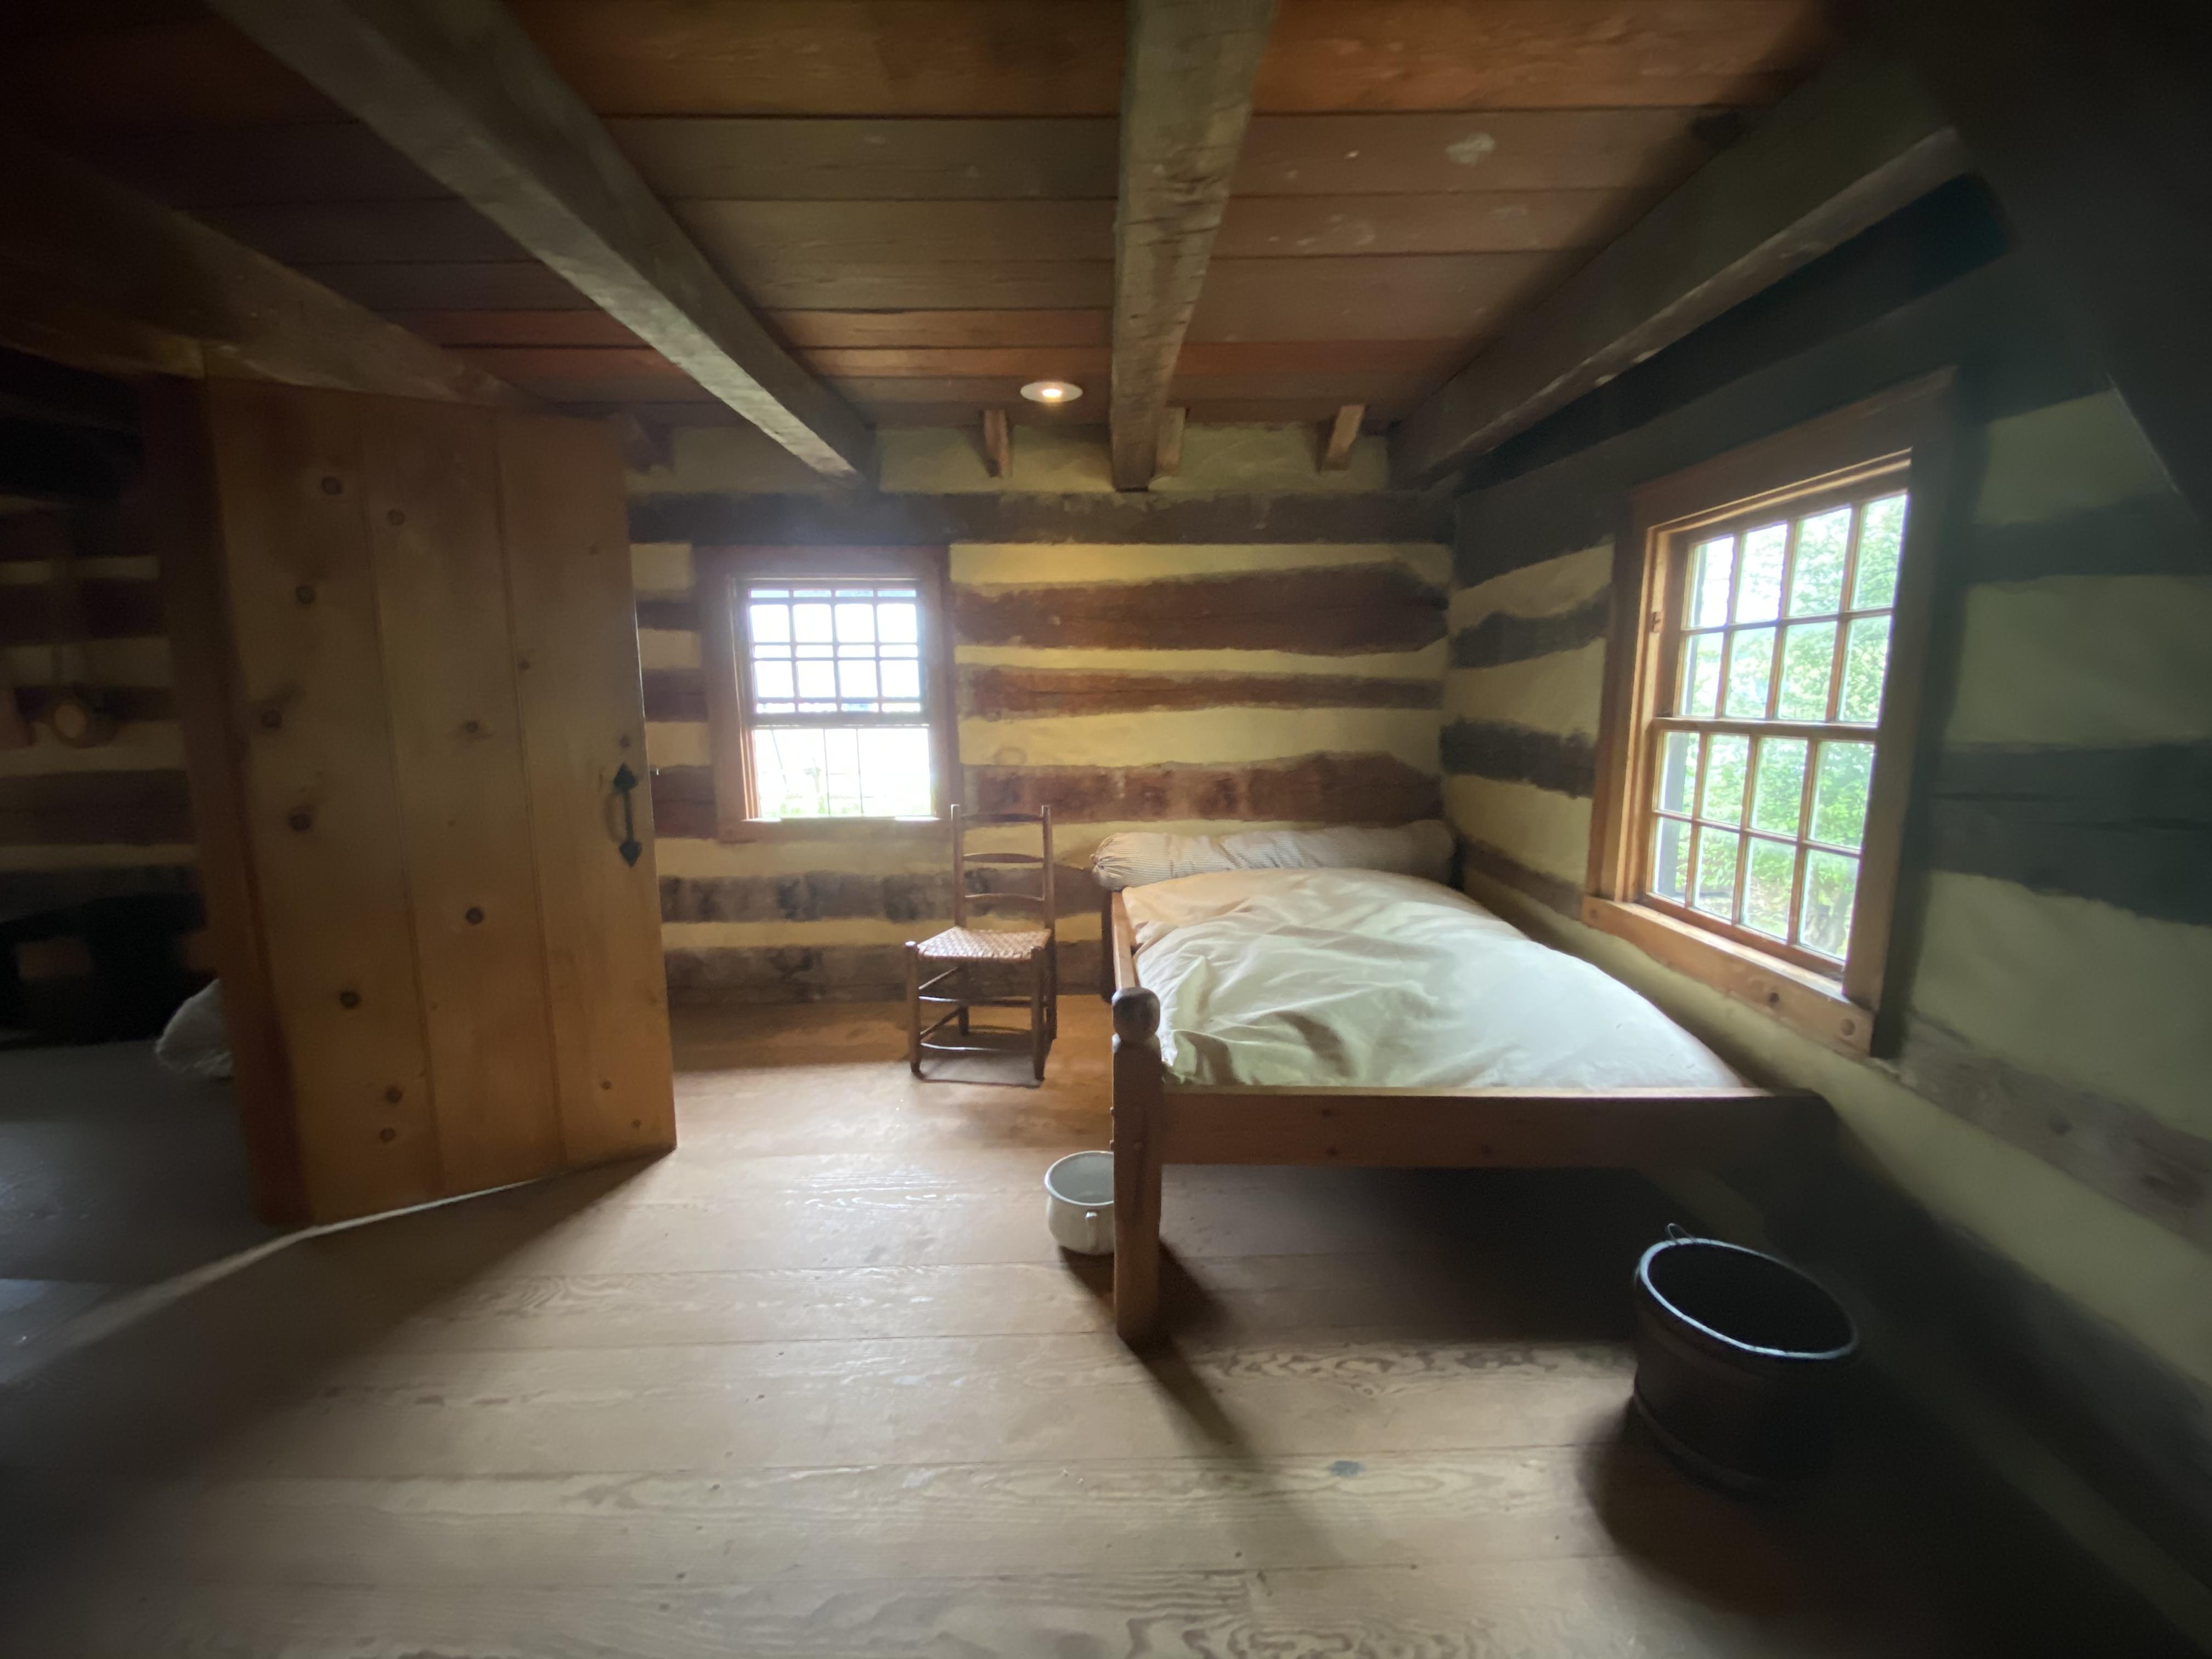 The travelers bedroom